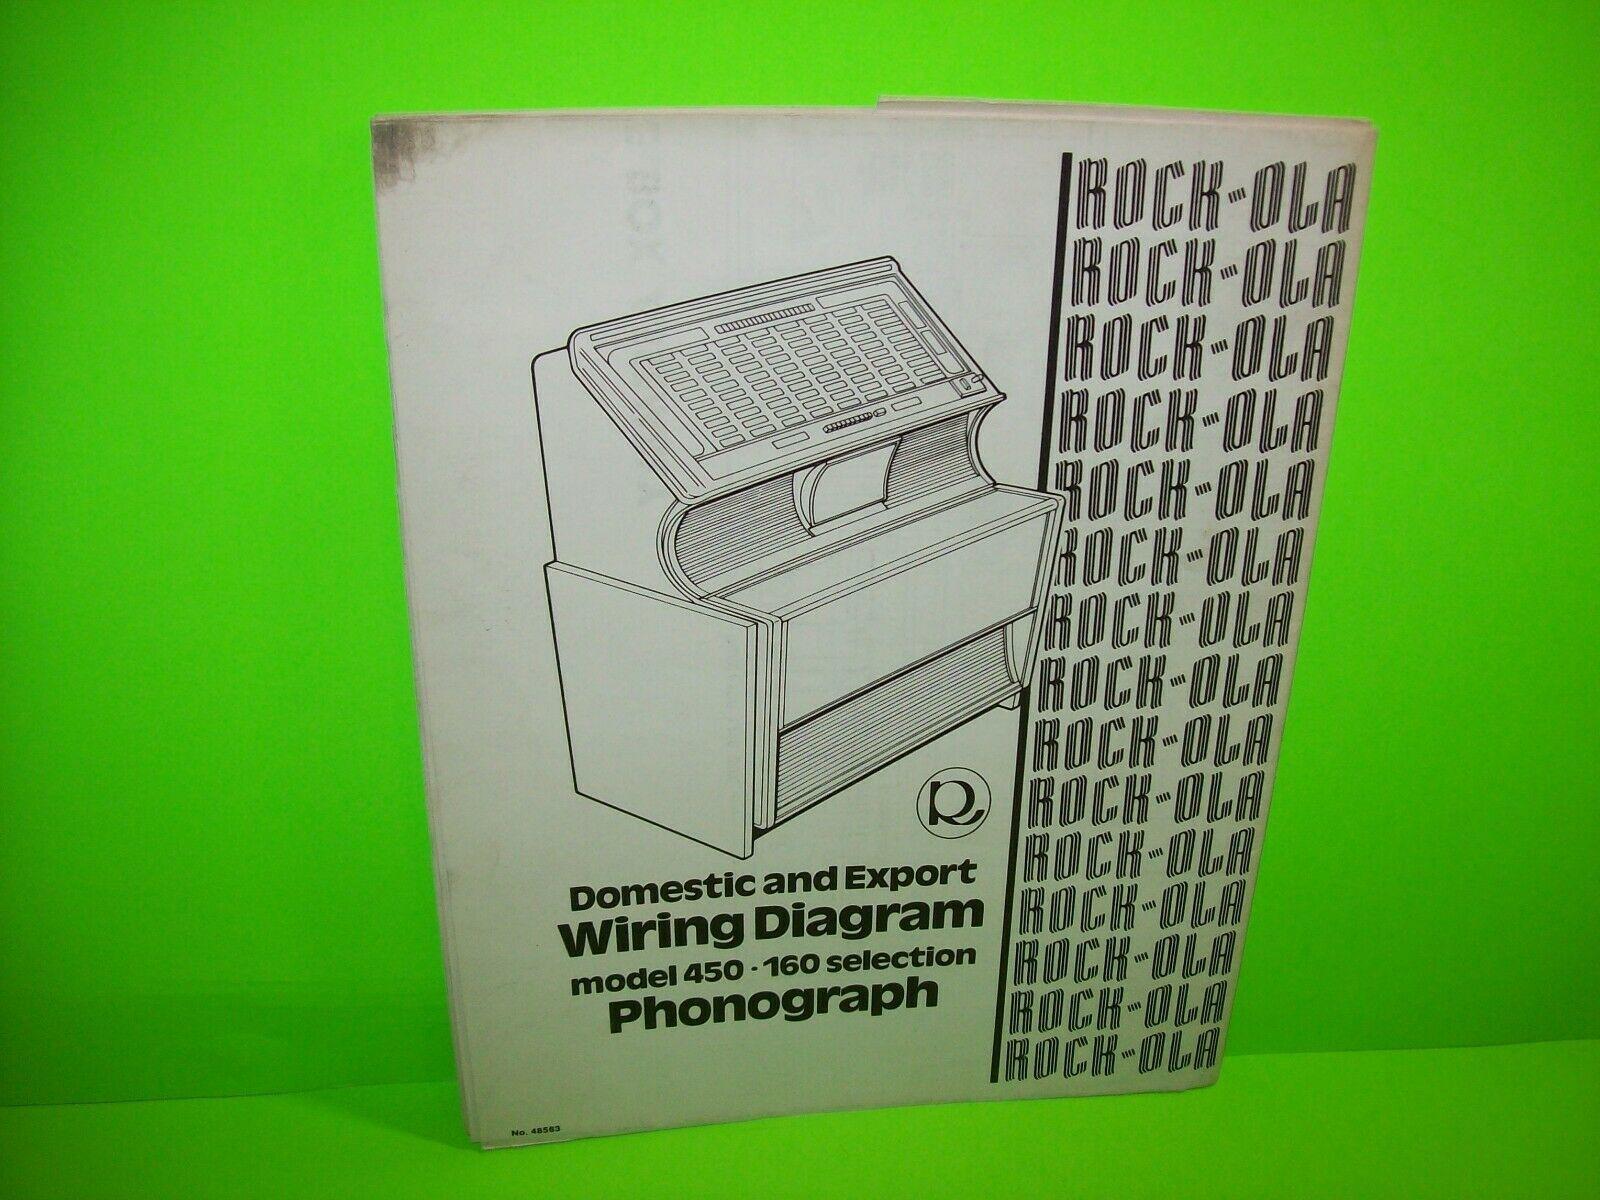 Rock Ola 450 Jukebox Phonograph Wiring Diagram Schematic Original 1970 Vintage